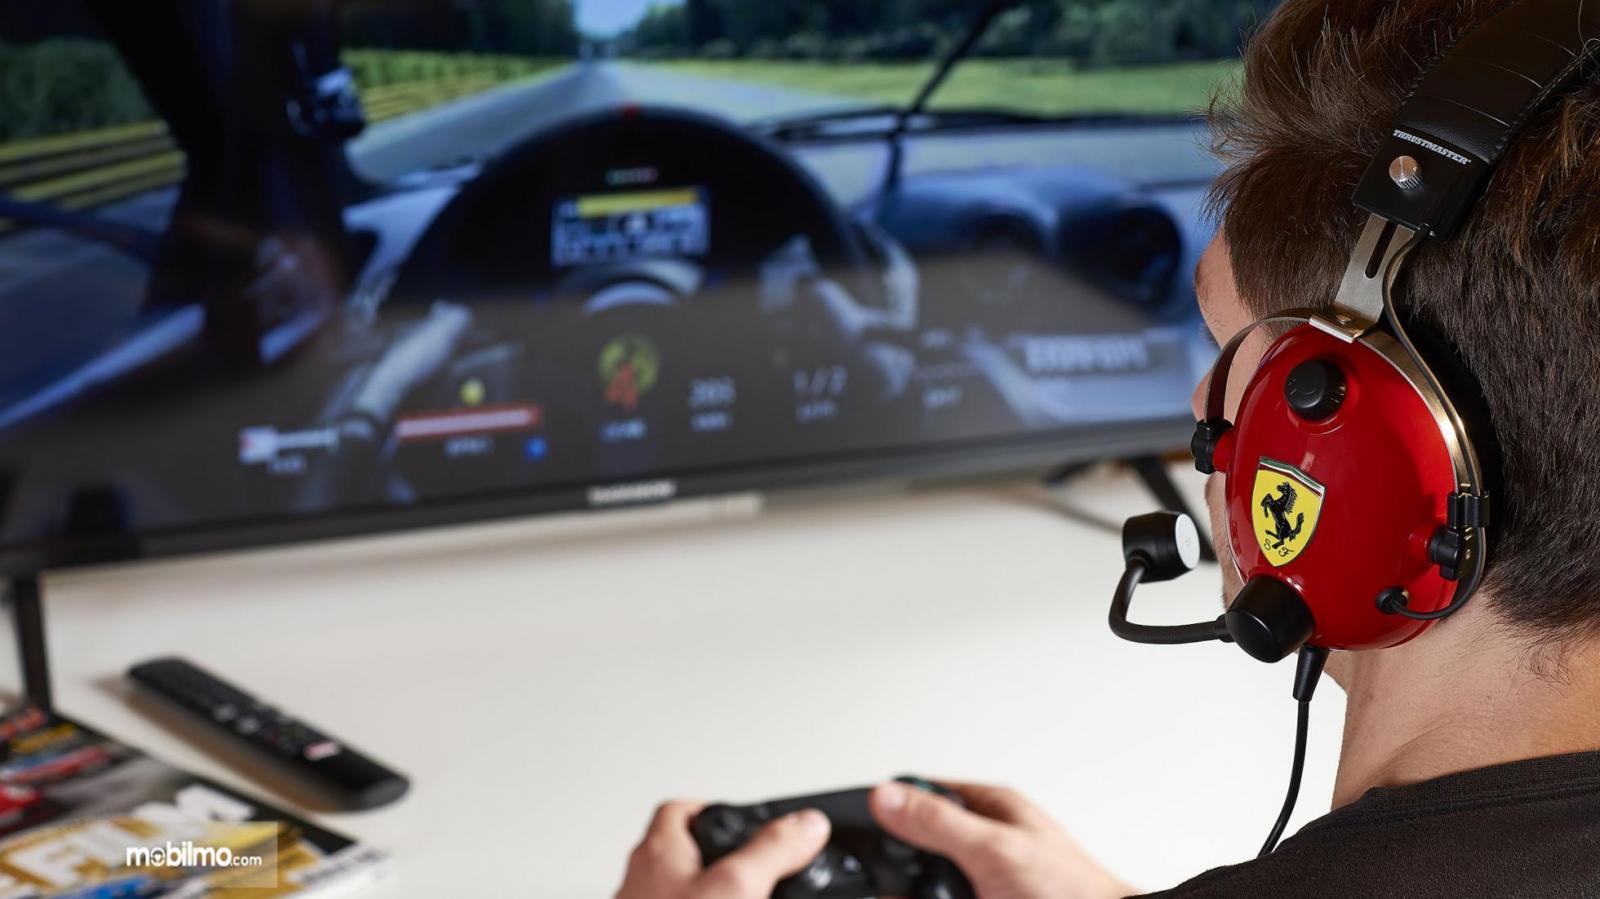 Gambar pengguna headset Theustmaster edisi Ferrari